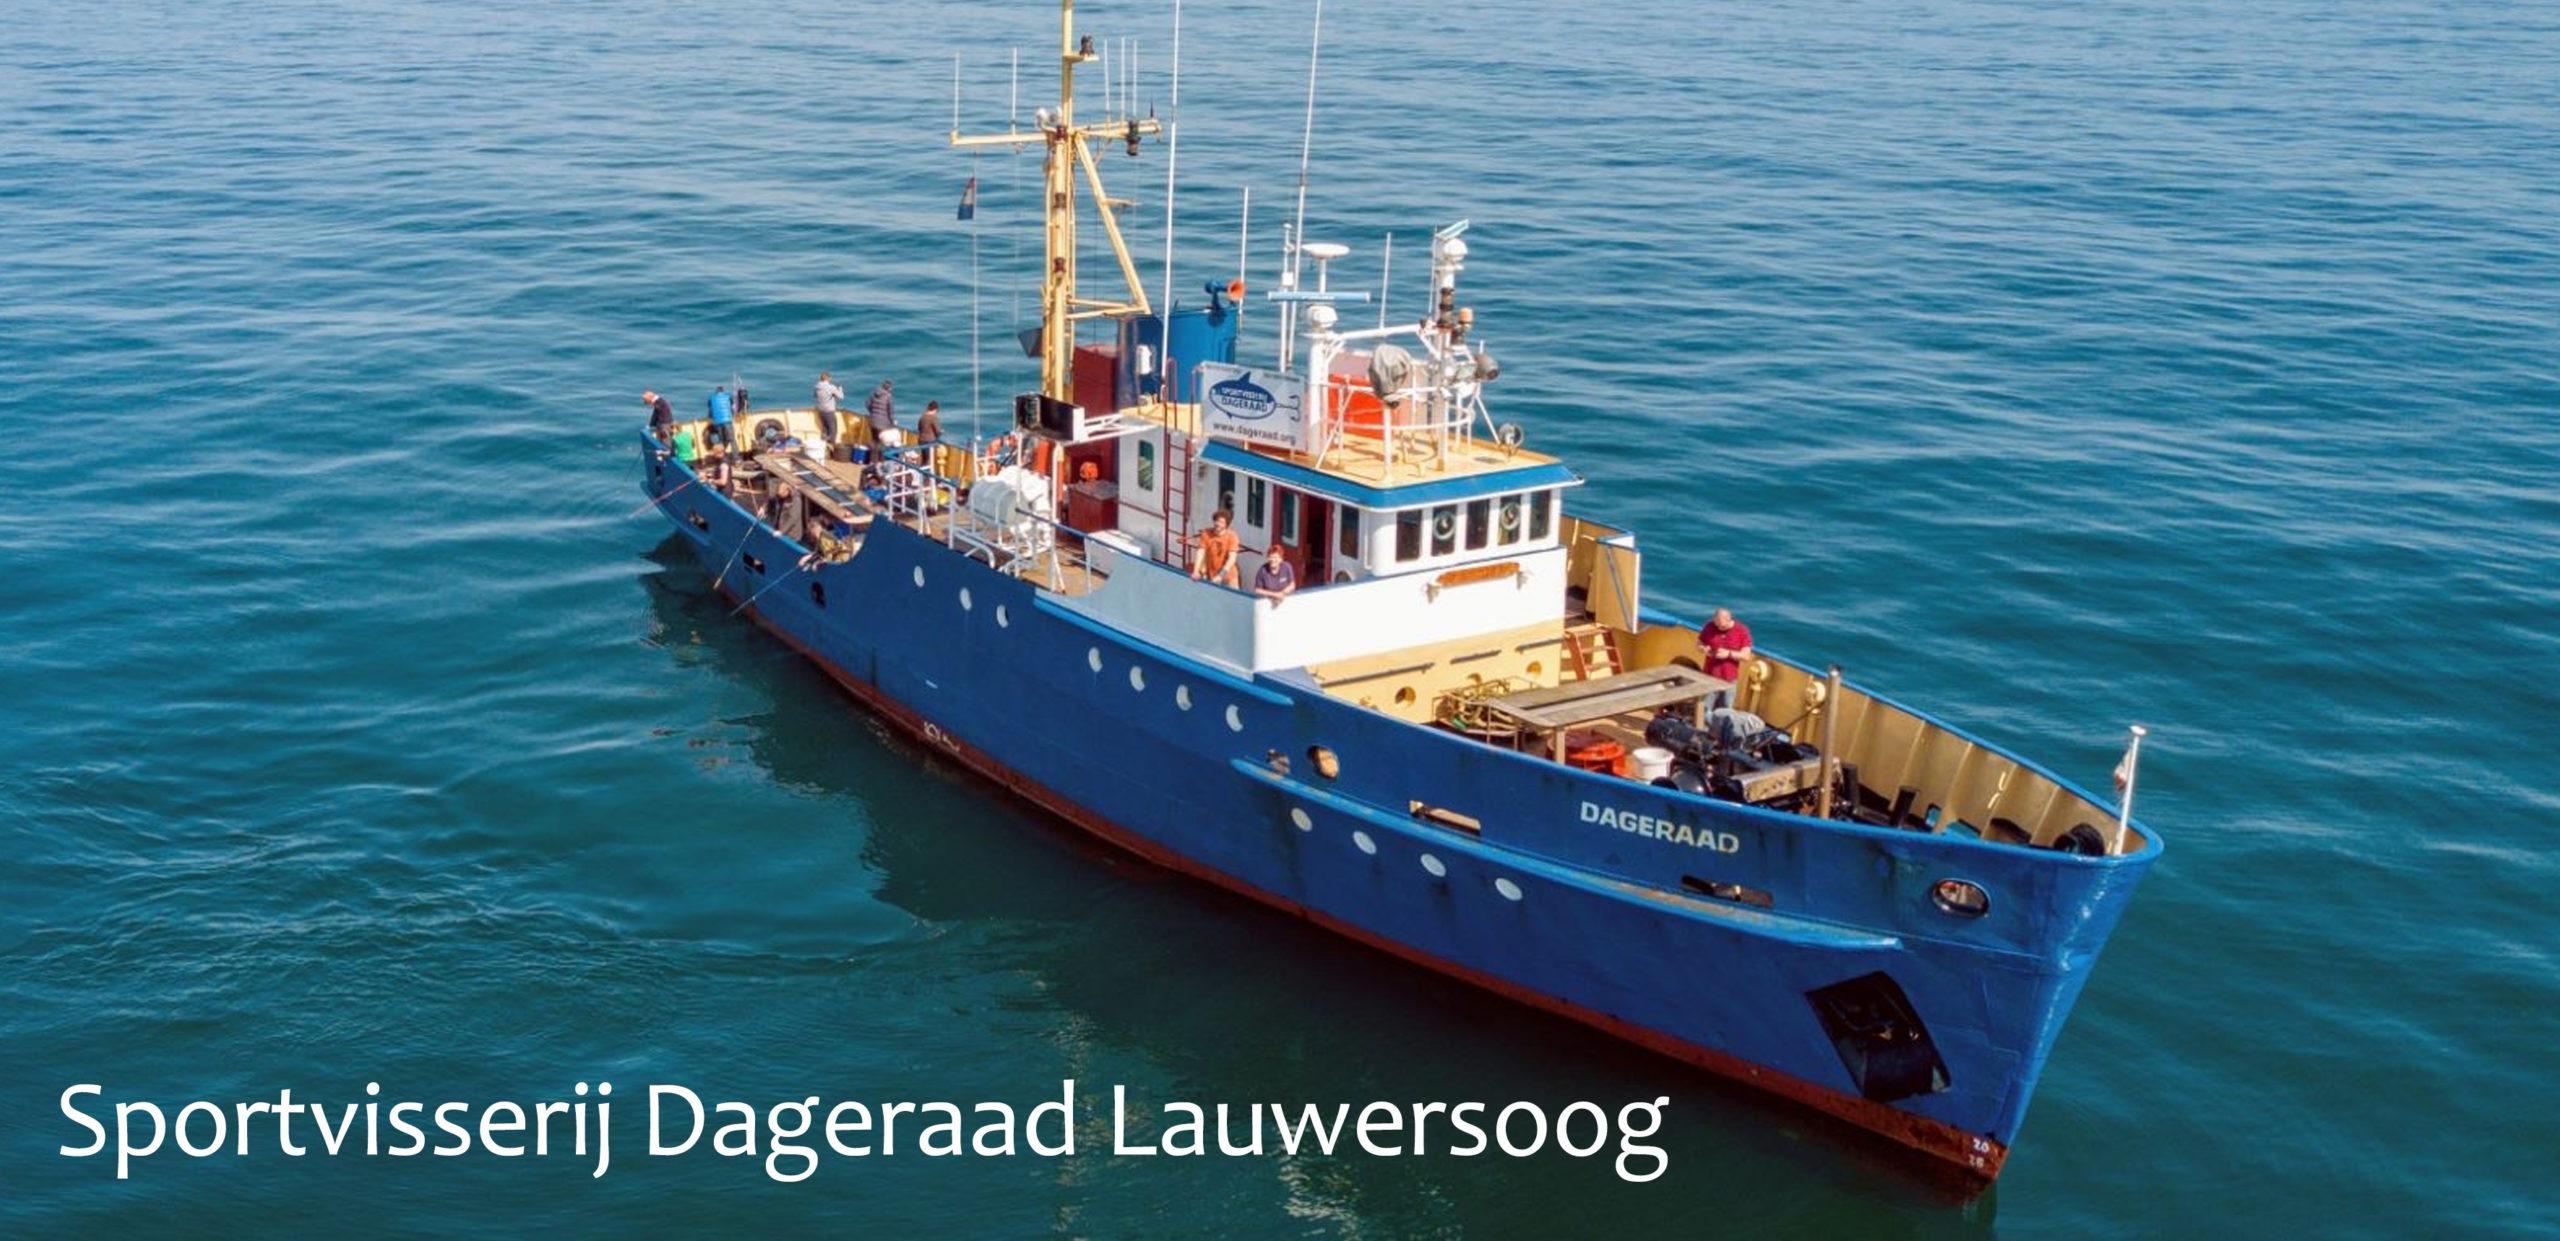 Sportvisserij Dageraad Lauwersoog